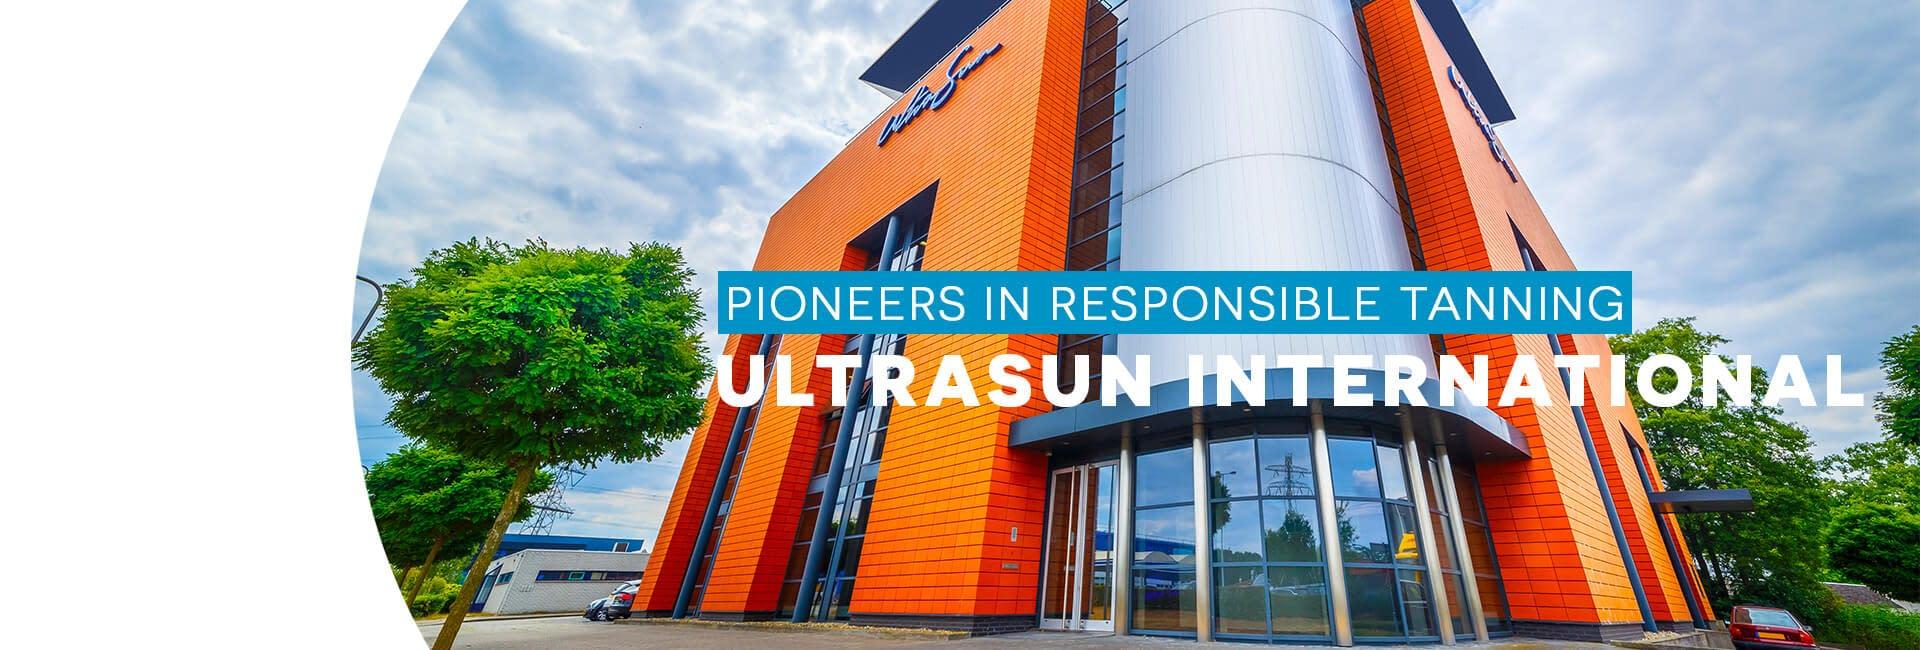 Ultrasun International headquarters